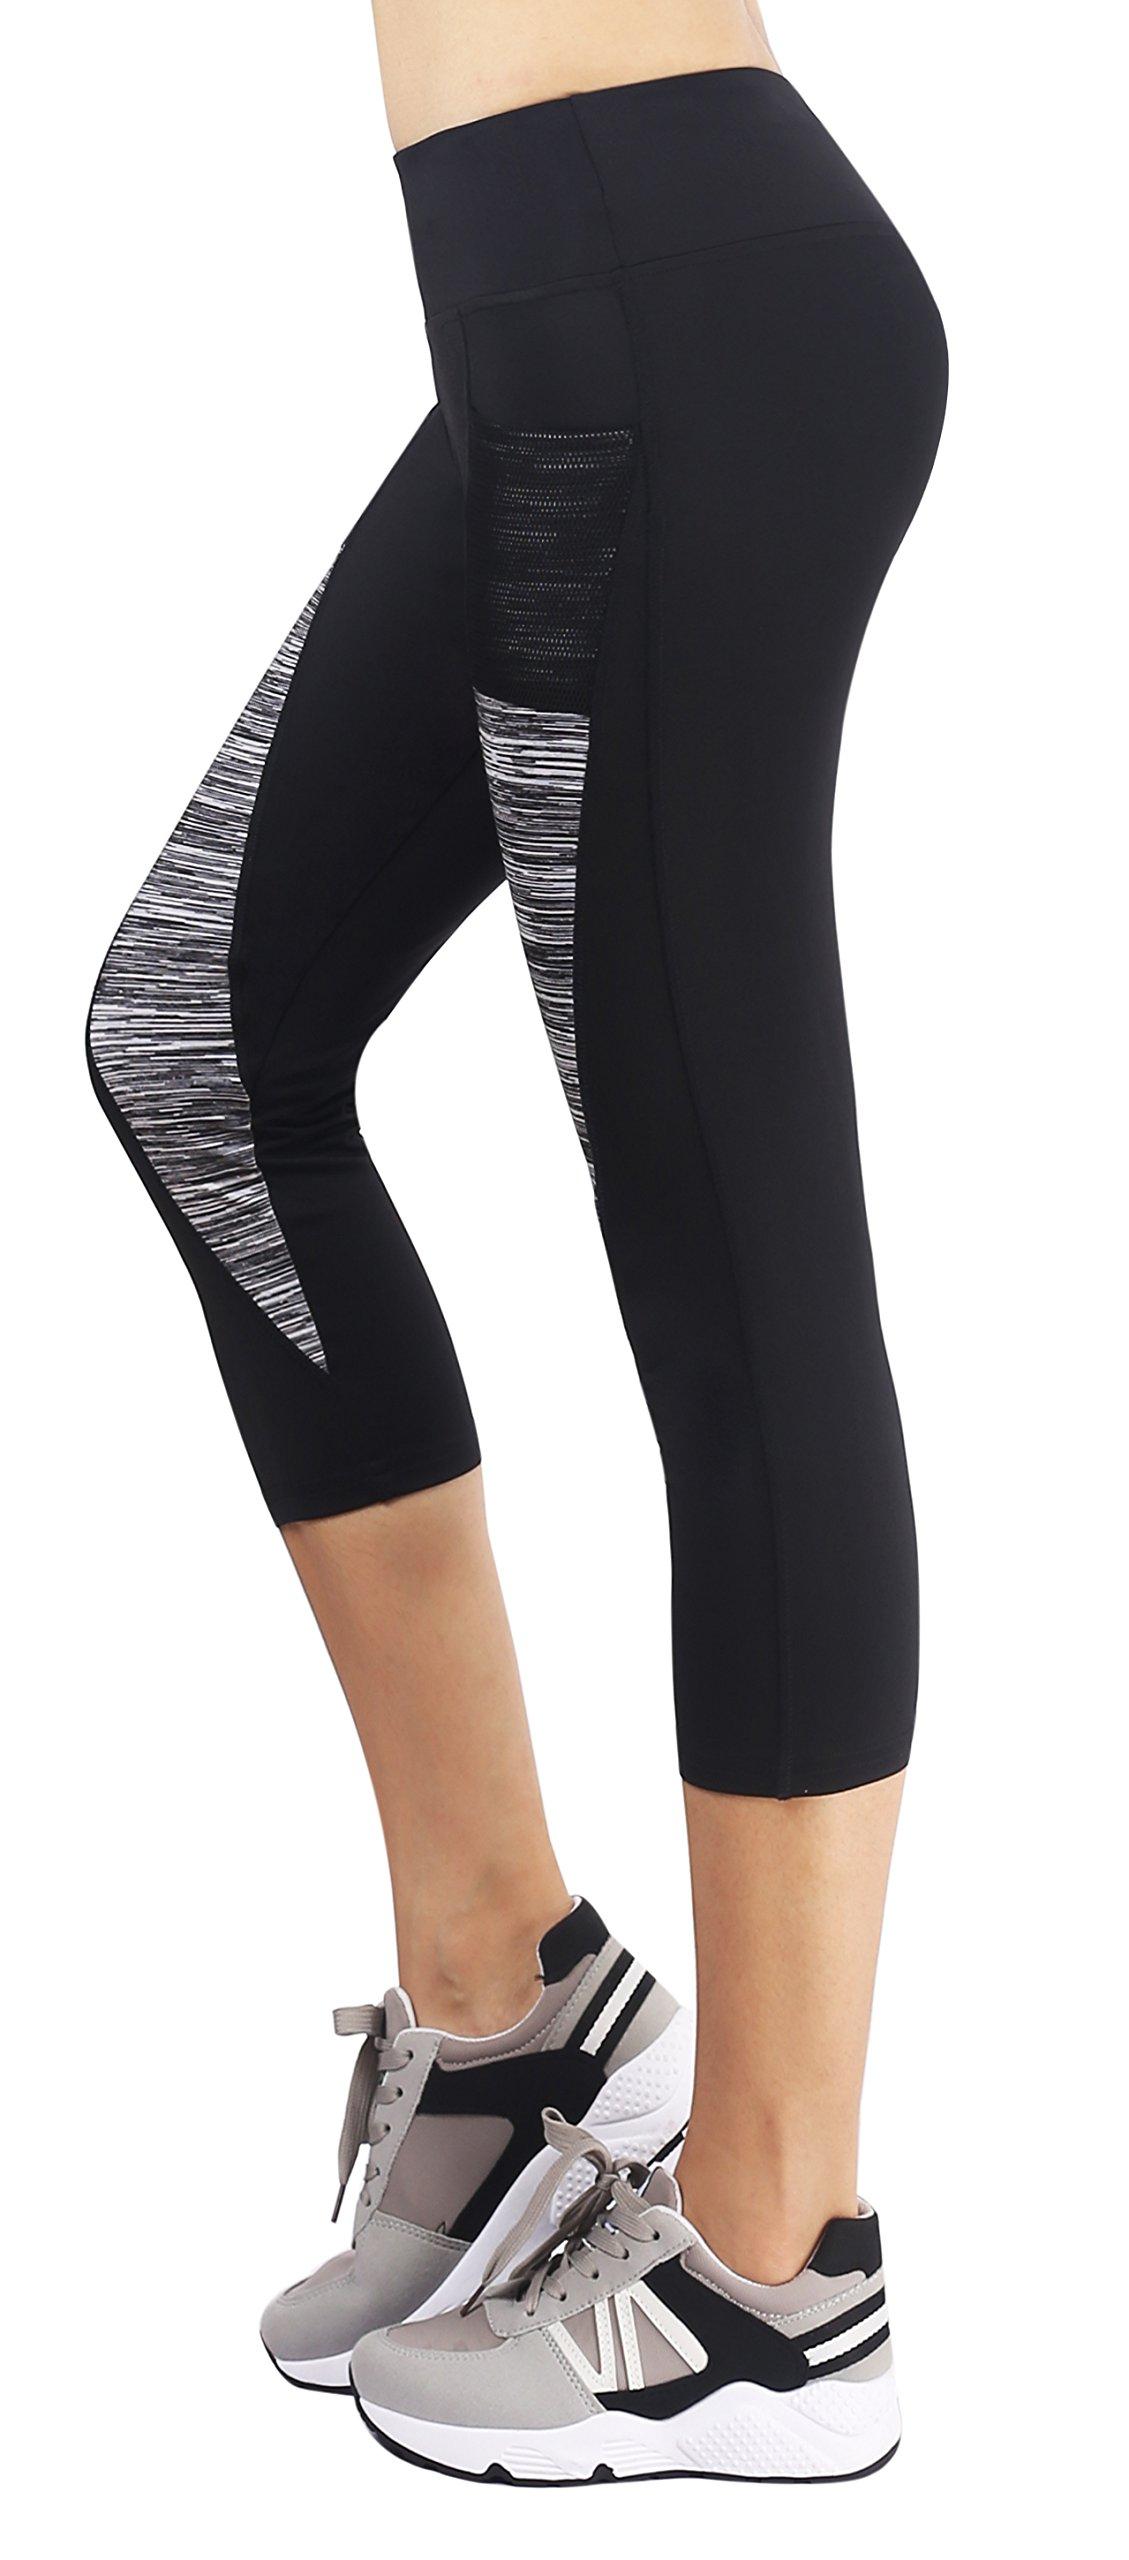 Sugar Pocket Women's Capris Leggingss Workout Tights Running Yoga Pants XL(Black/Grey)